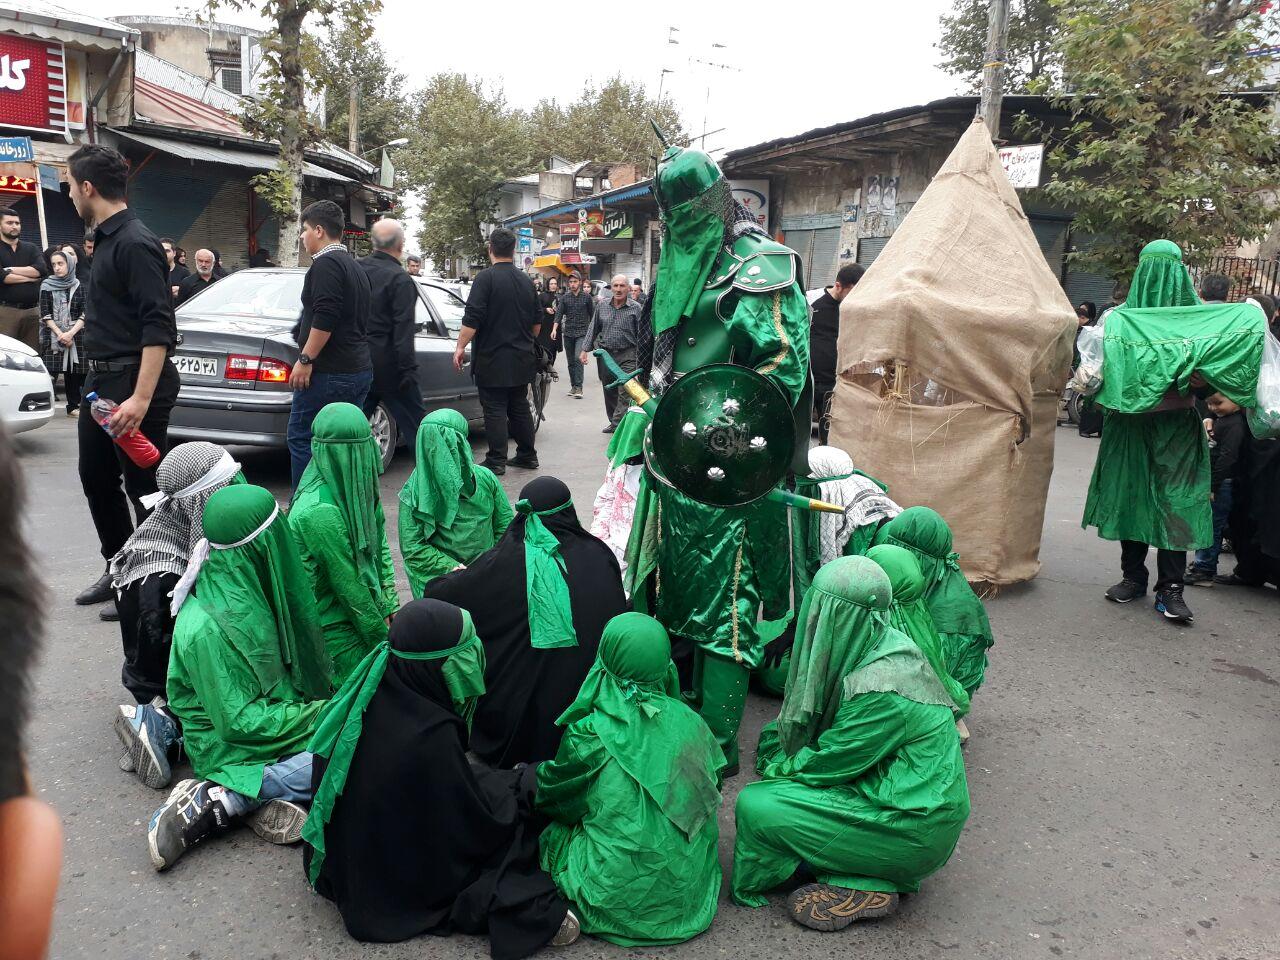 عزاداري هيئت موسي بن جعفر (ع) شهر فومن در روز عاشوراي حسيني /تصاوير